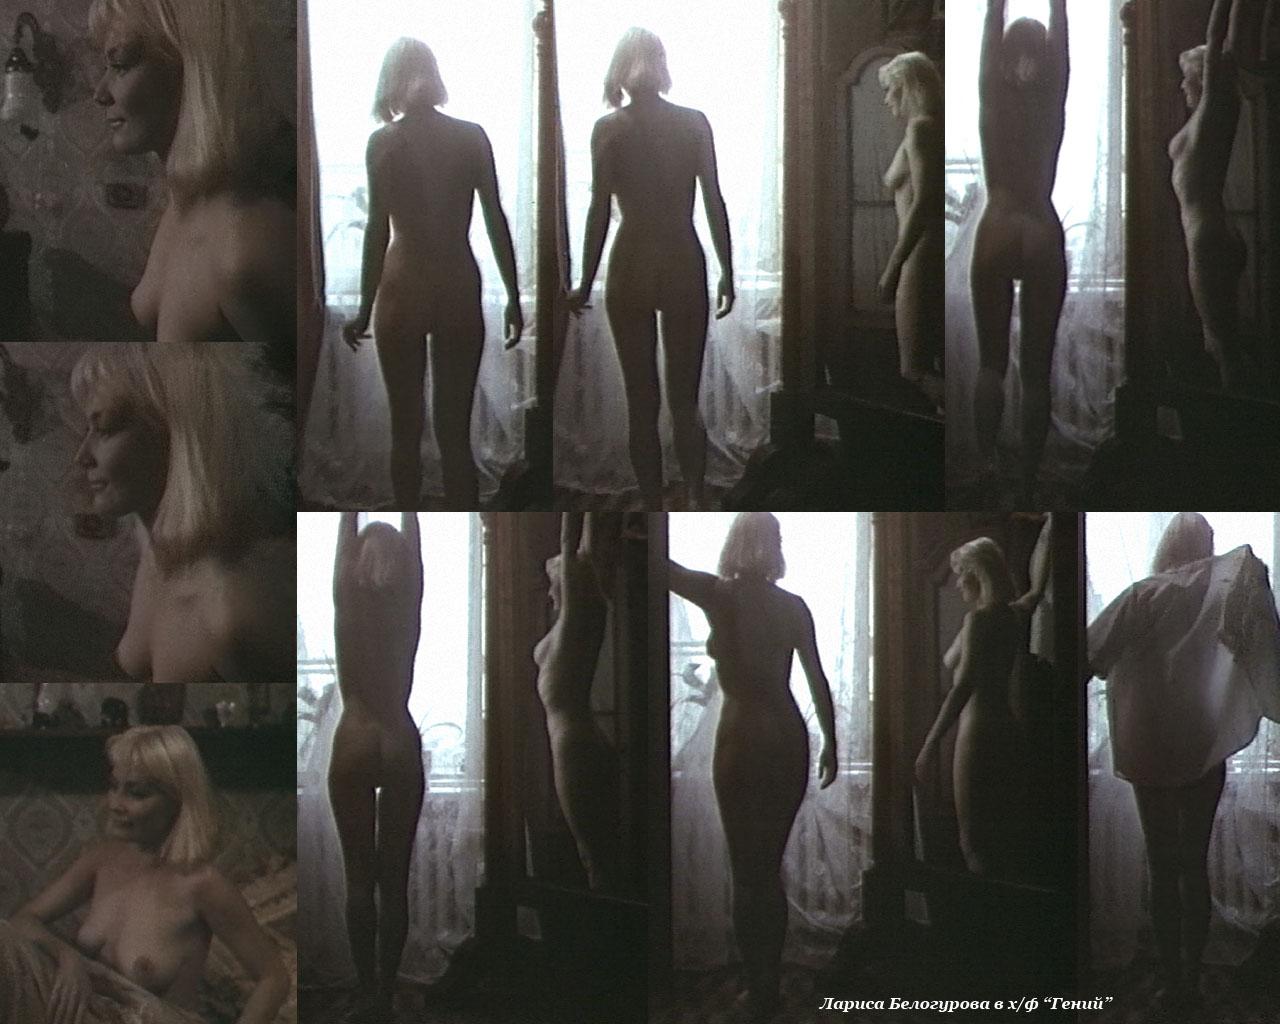 Лариса белогурова в порно